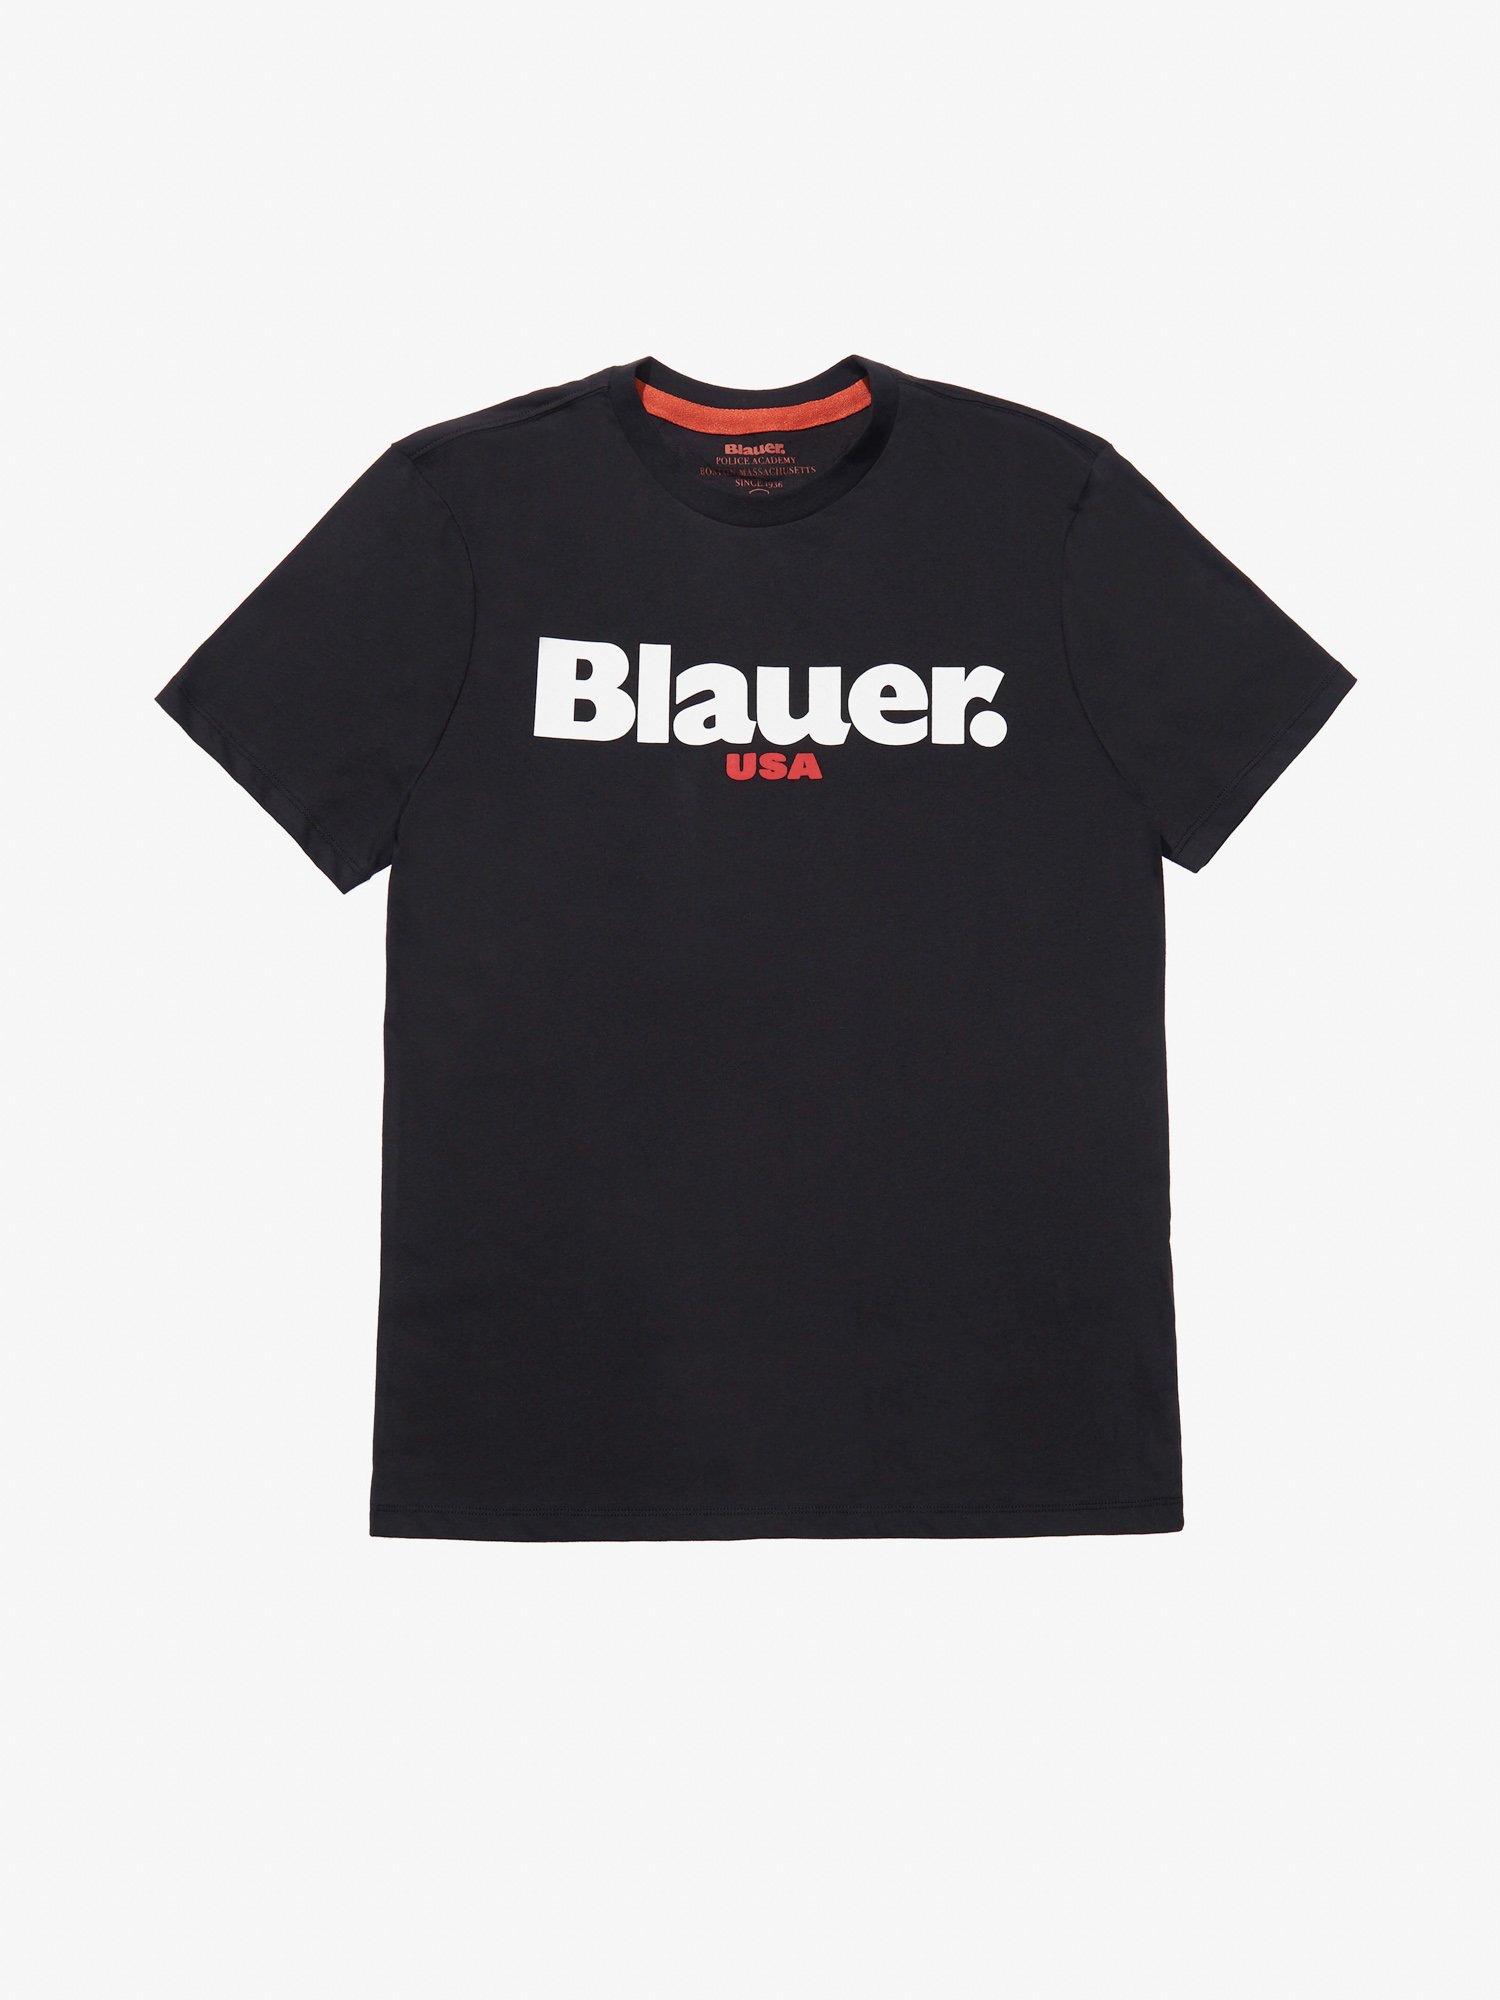 T-SHIRT CARBON WASHED BLAUER USA - Blauer